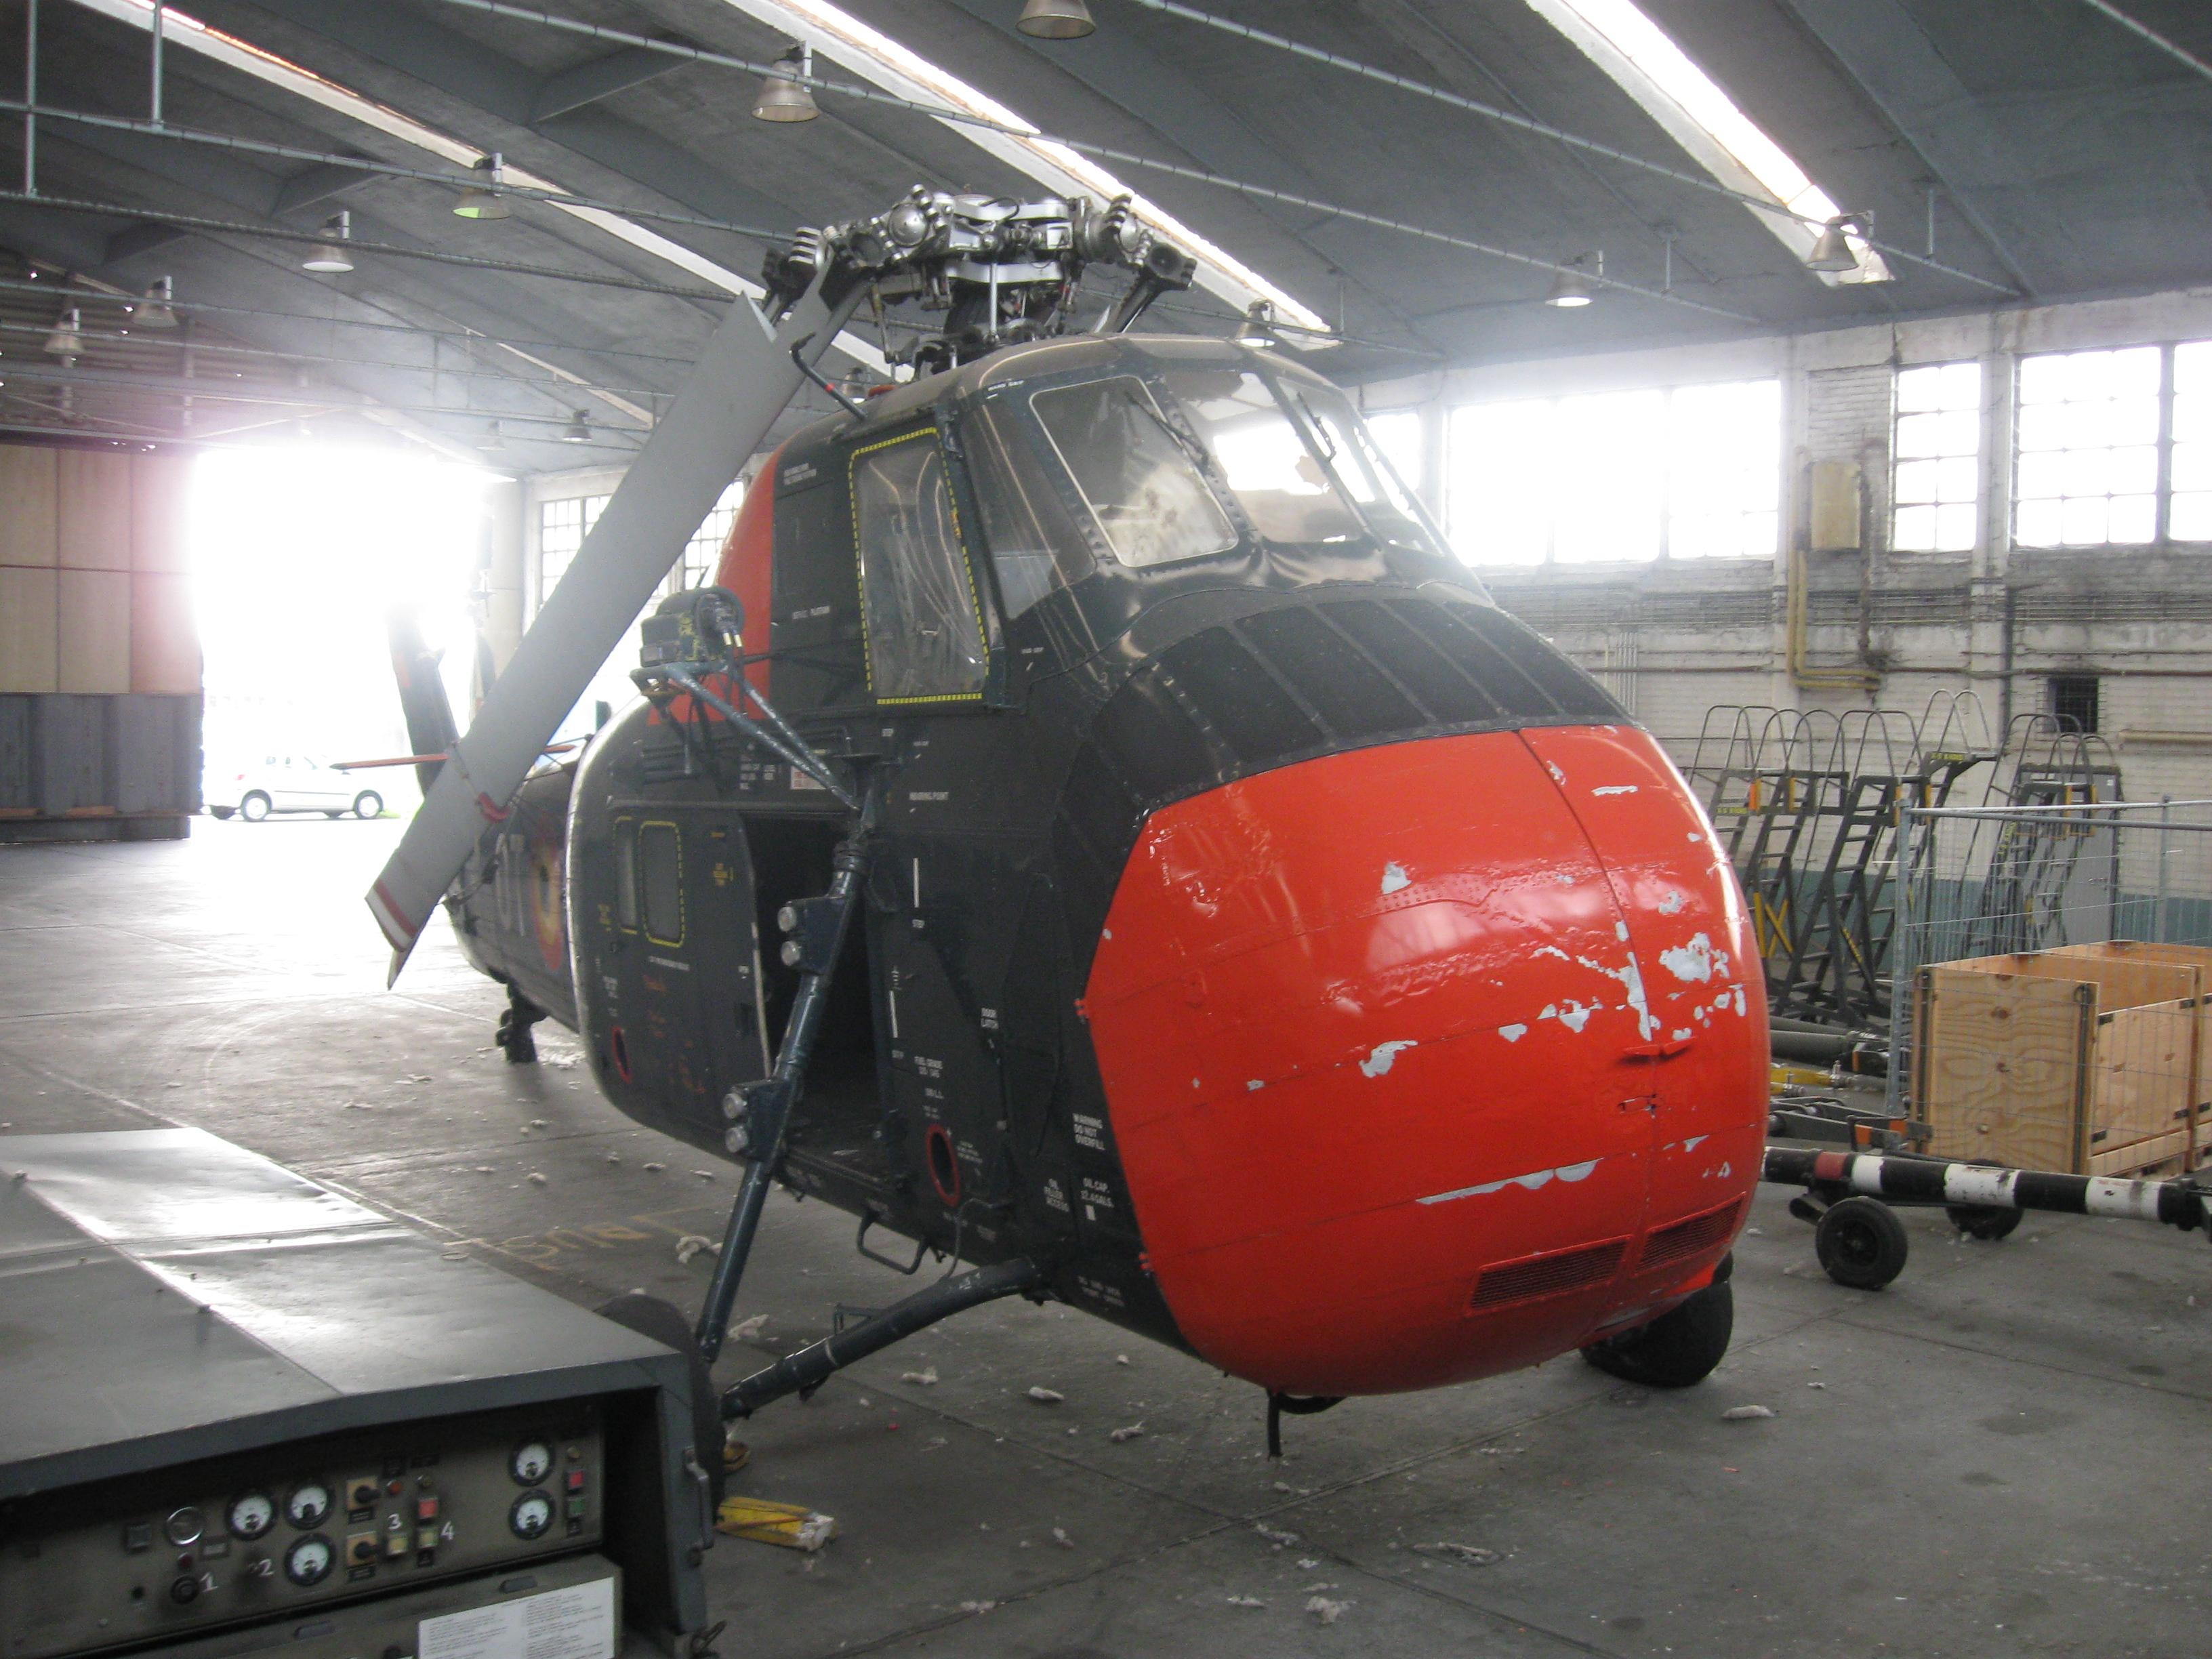 Sikorsky H-34 1008190742461050246592441